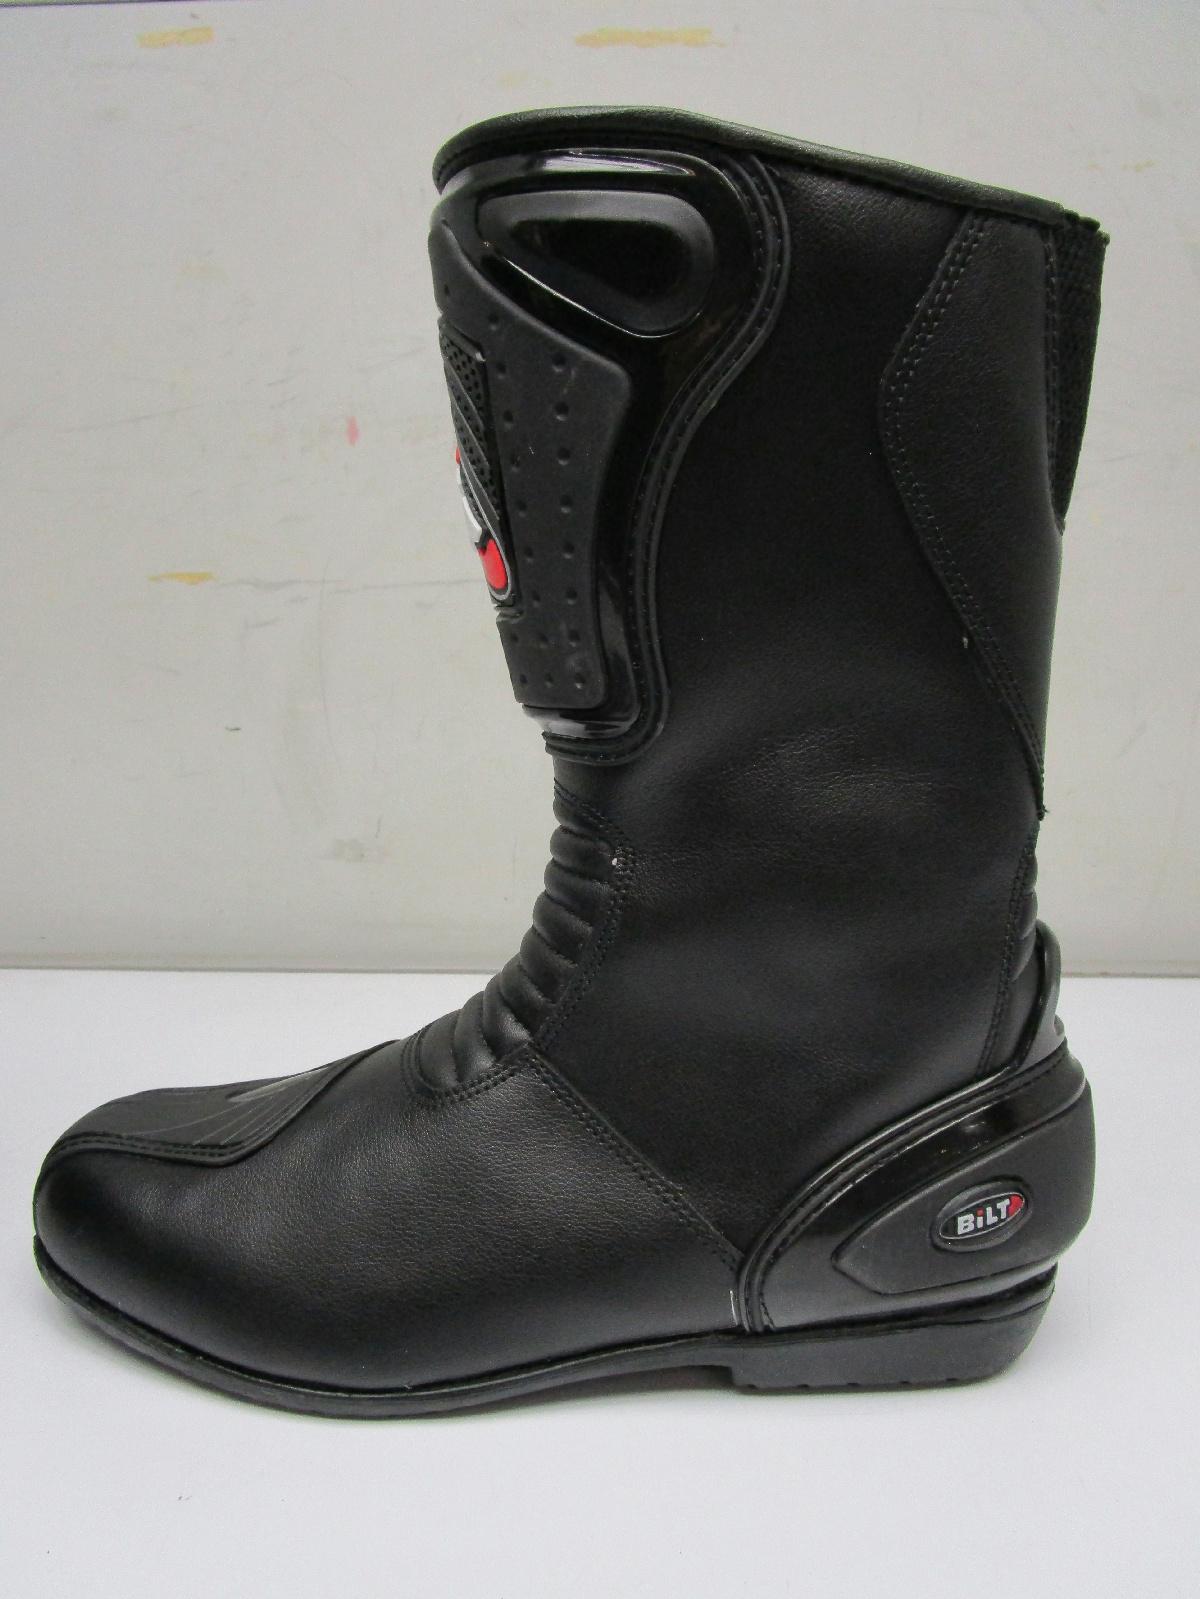 bilt hurricane waterproof leather motorcycle boots s